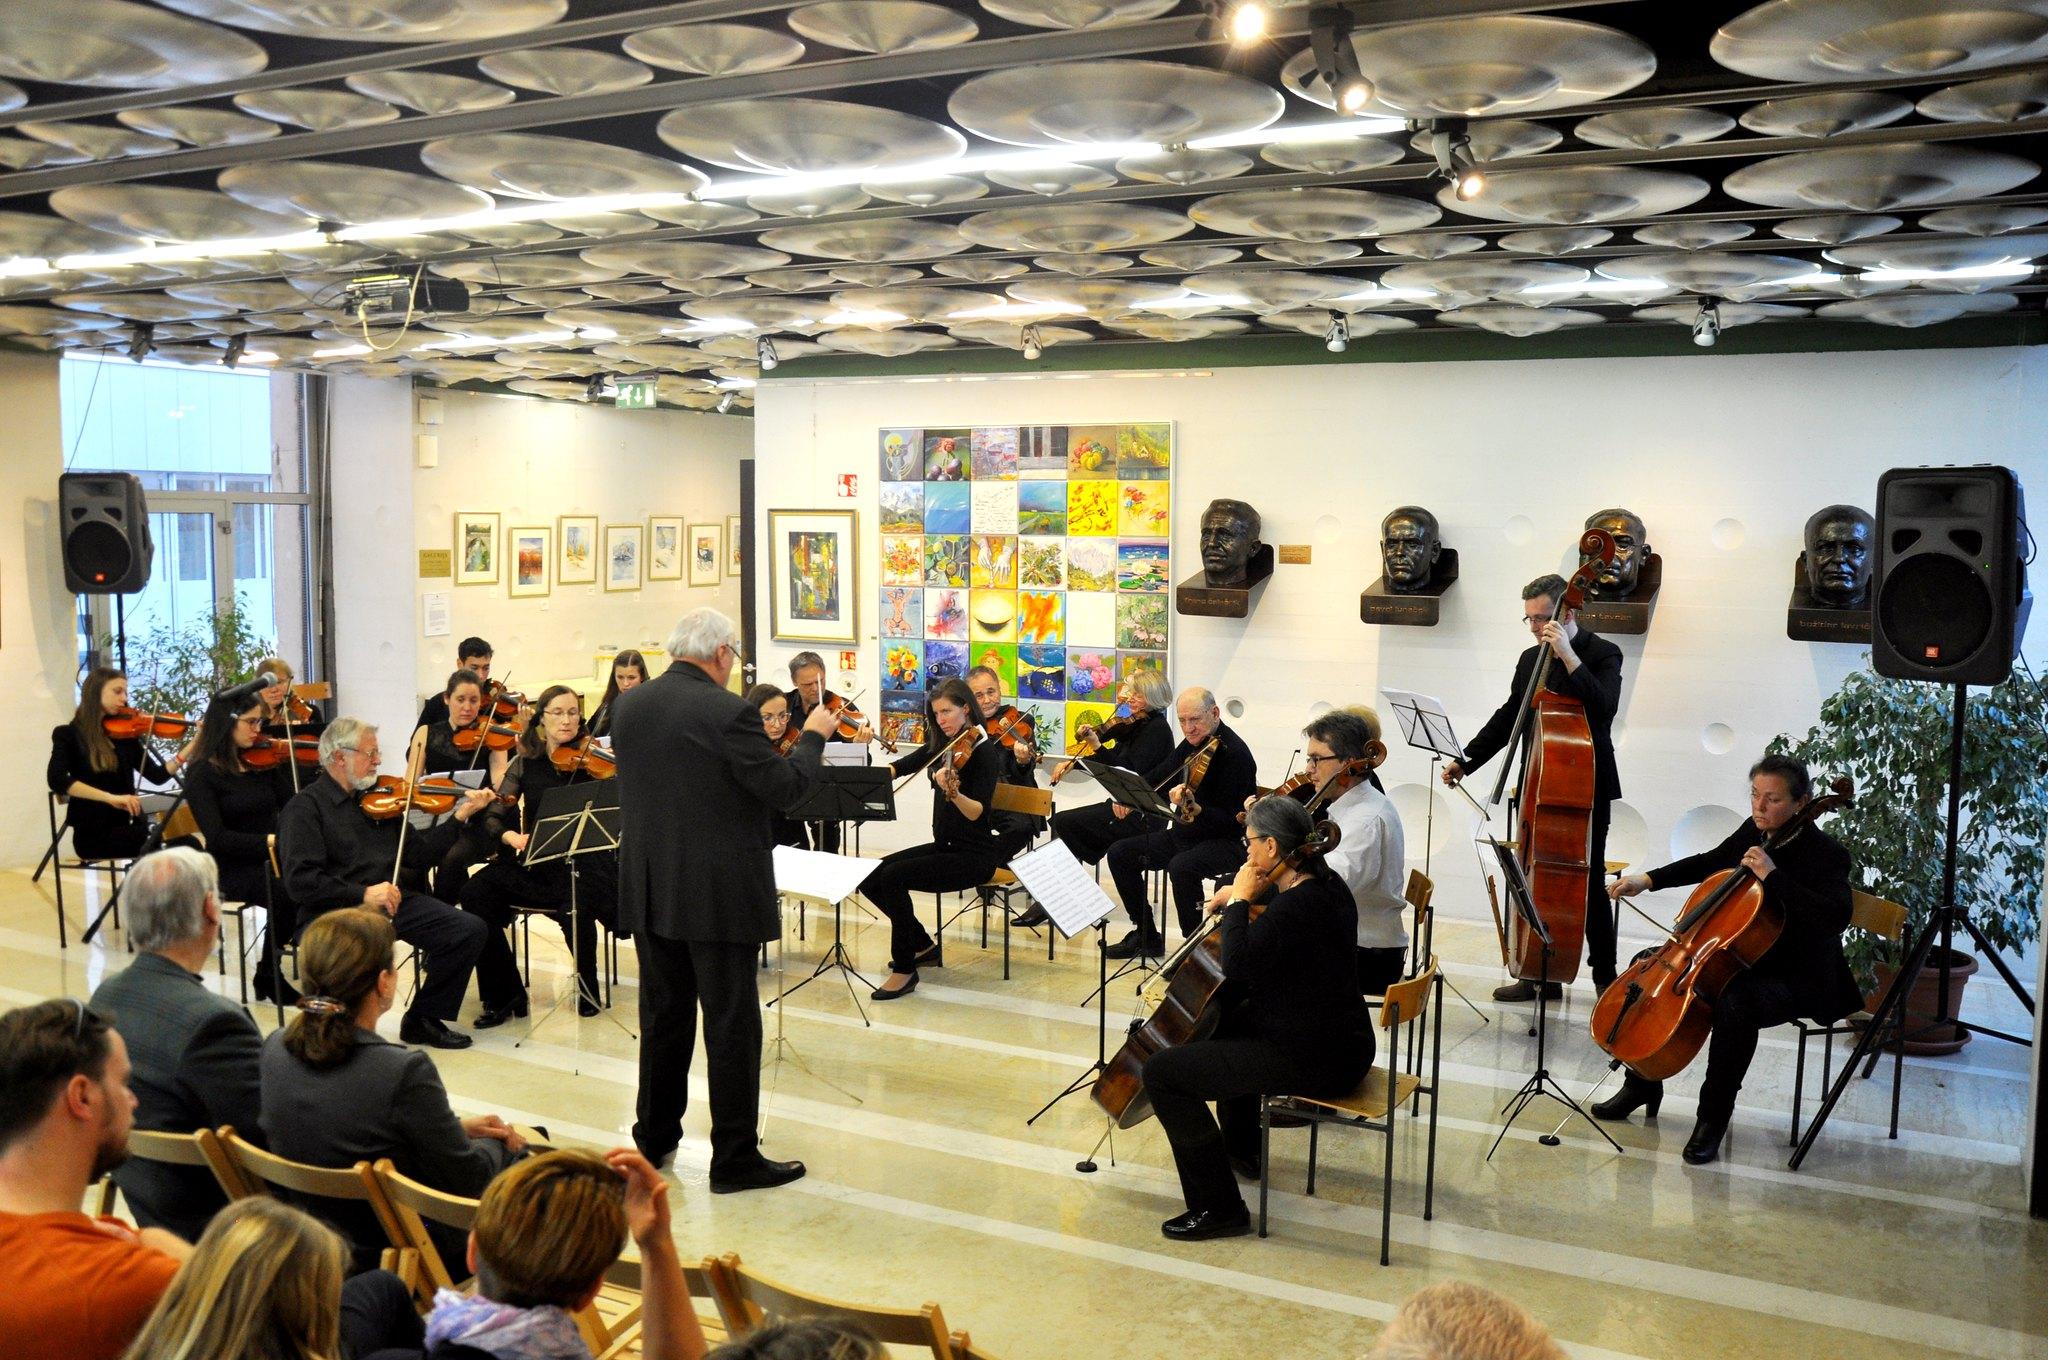 razstava Petra Lazarevića in skupine akvarelistov - KC februar 2 074